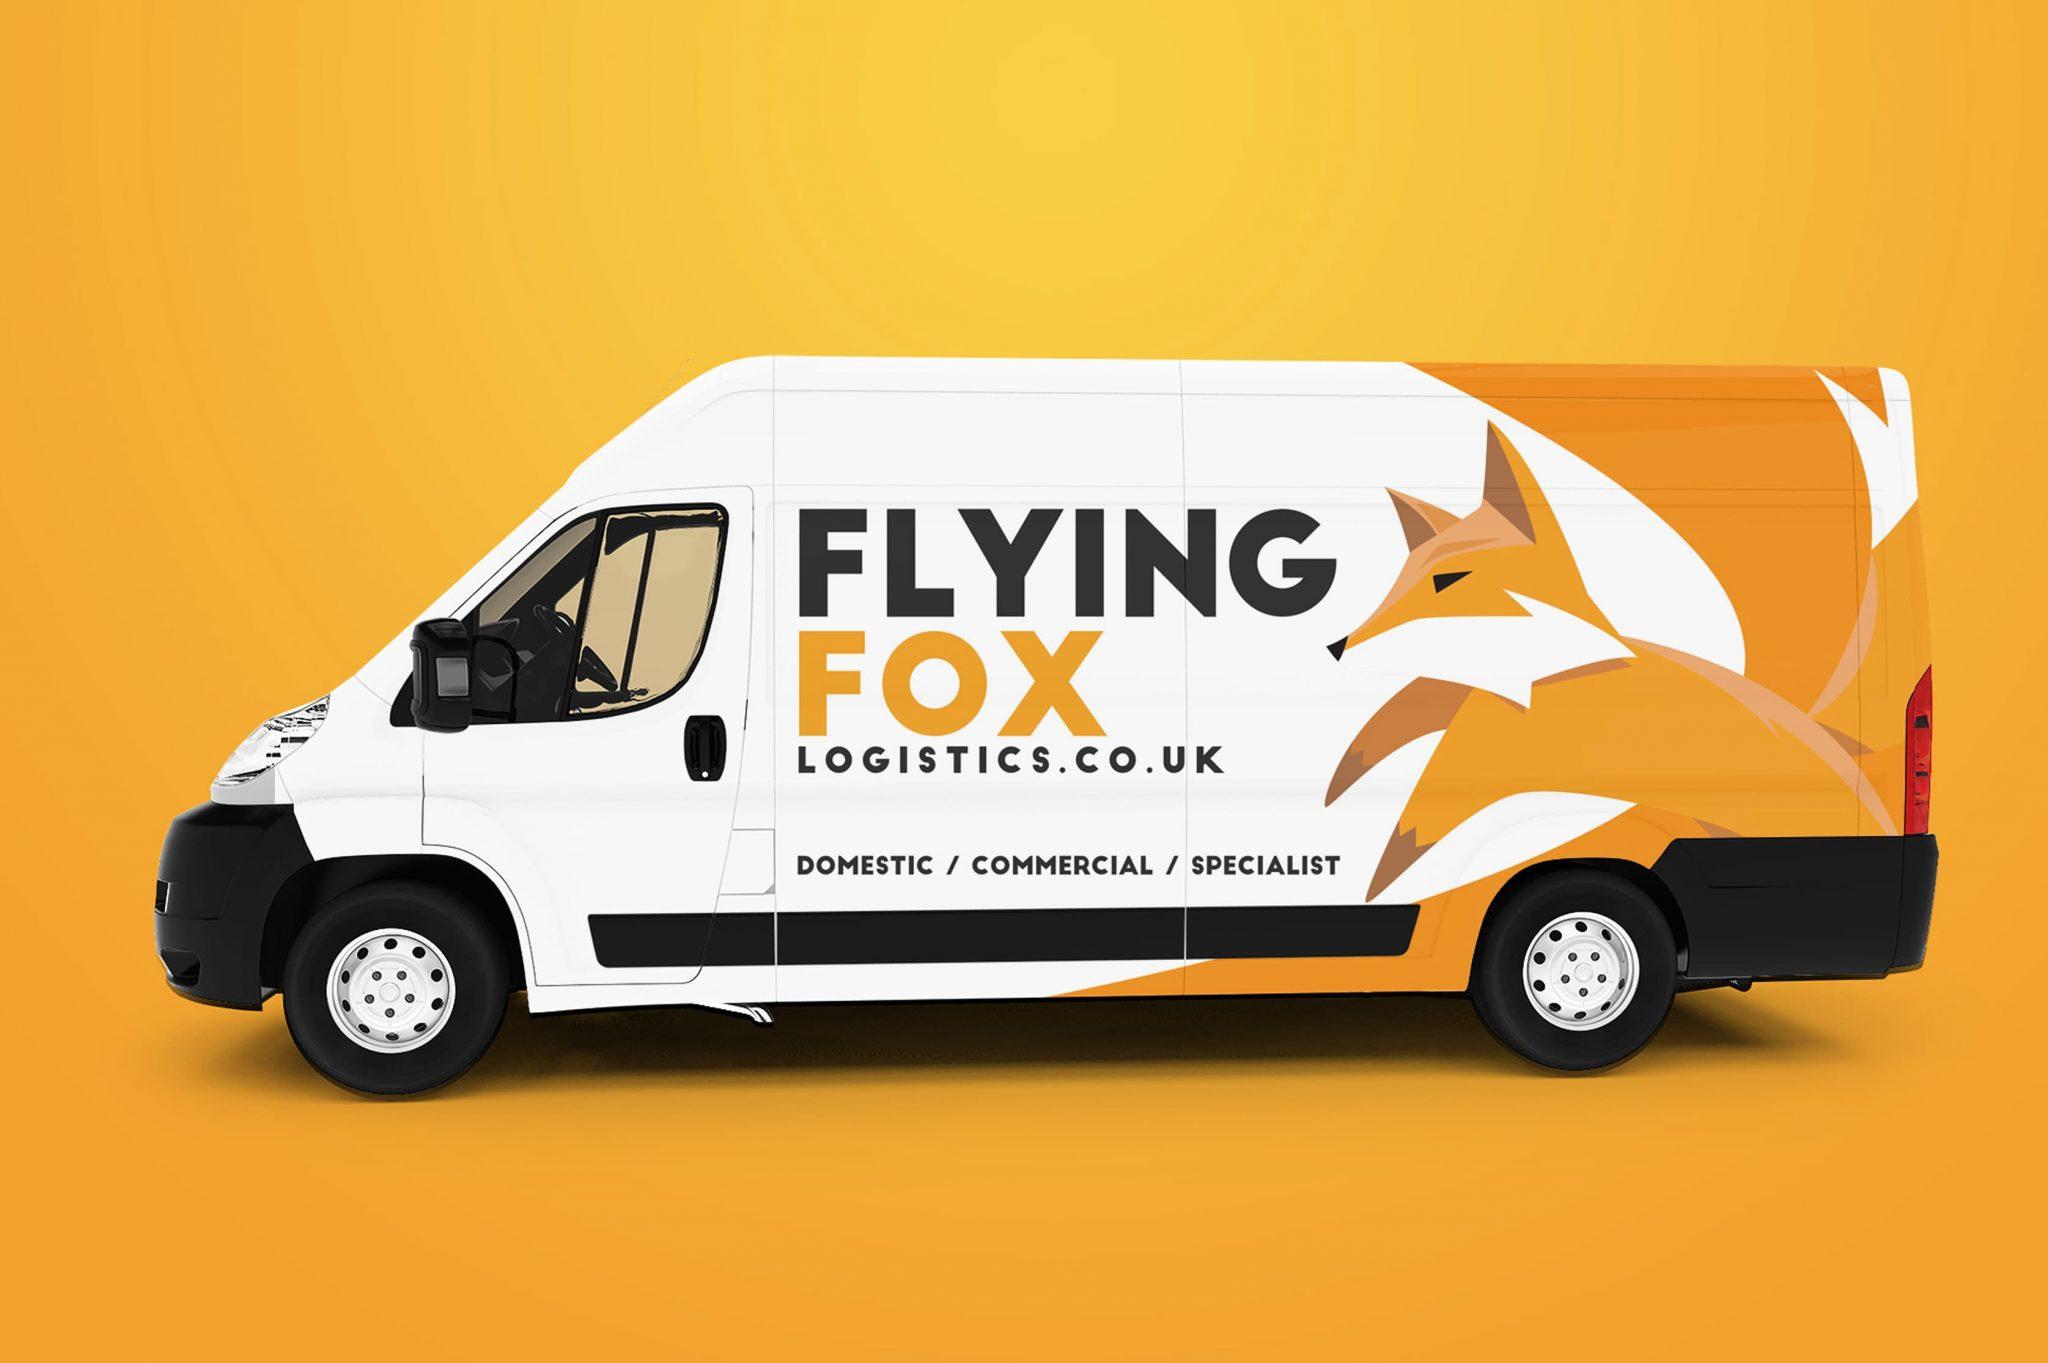 Flying Fox Logistics